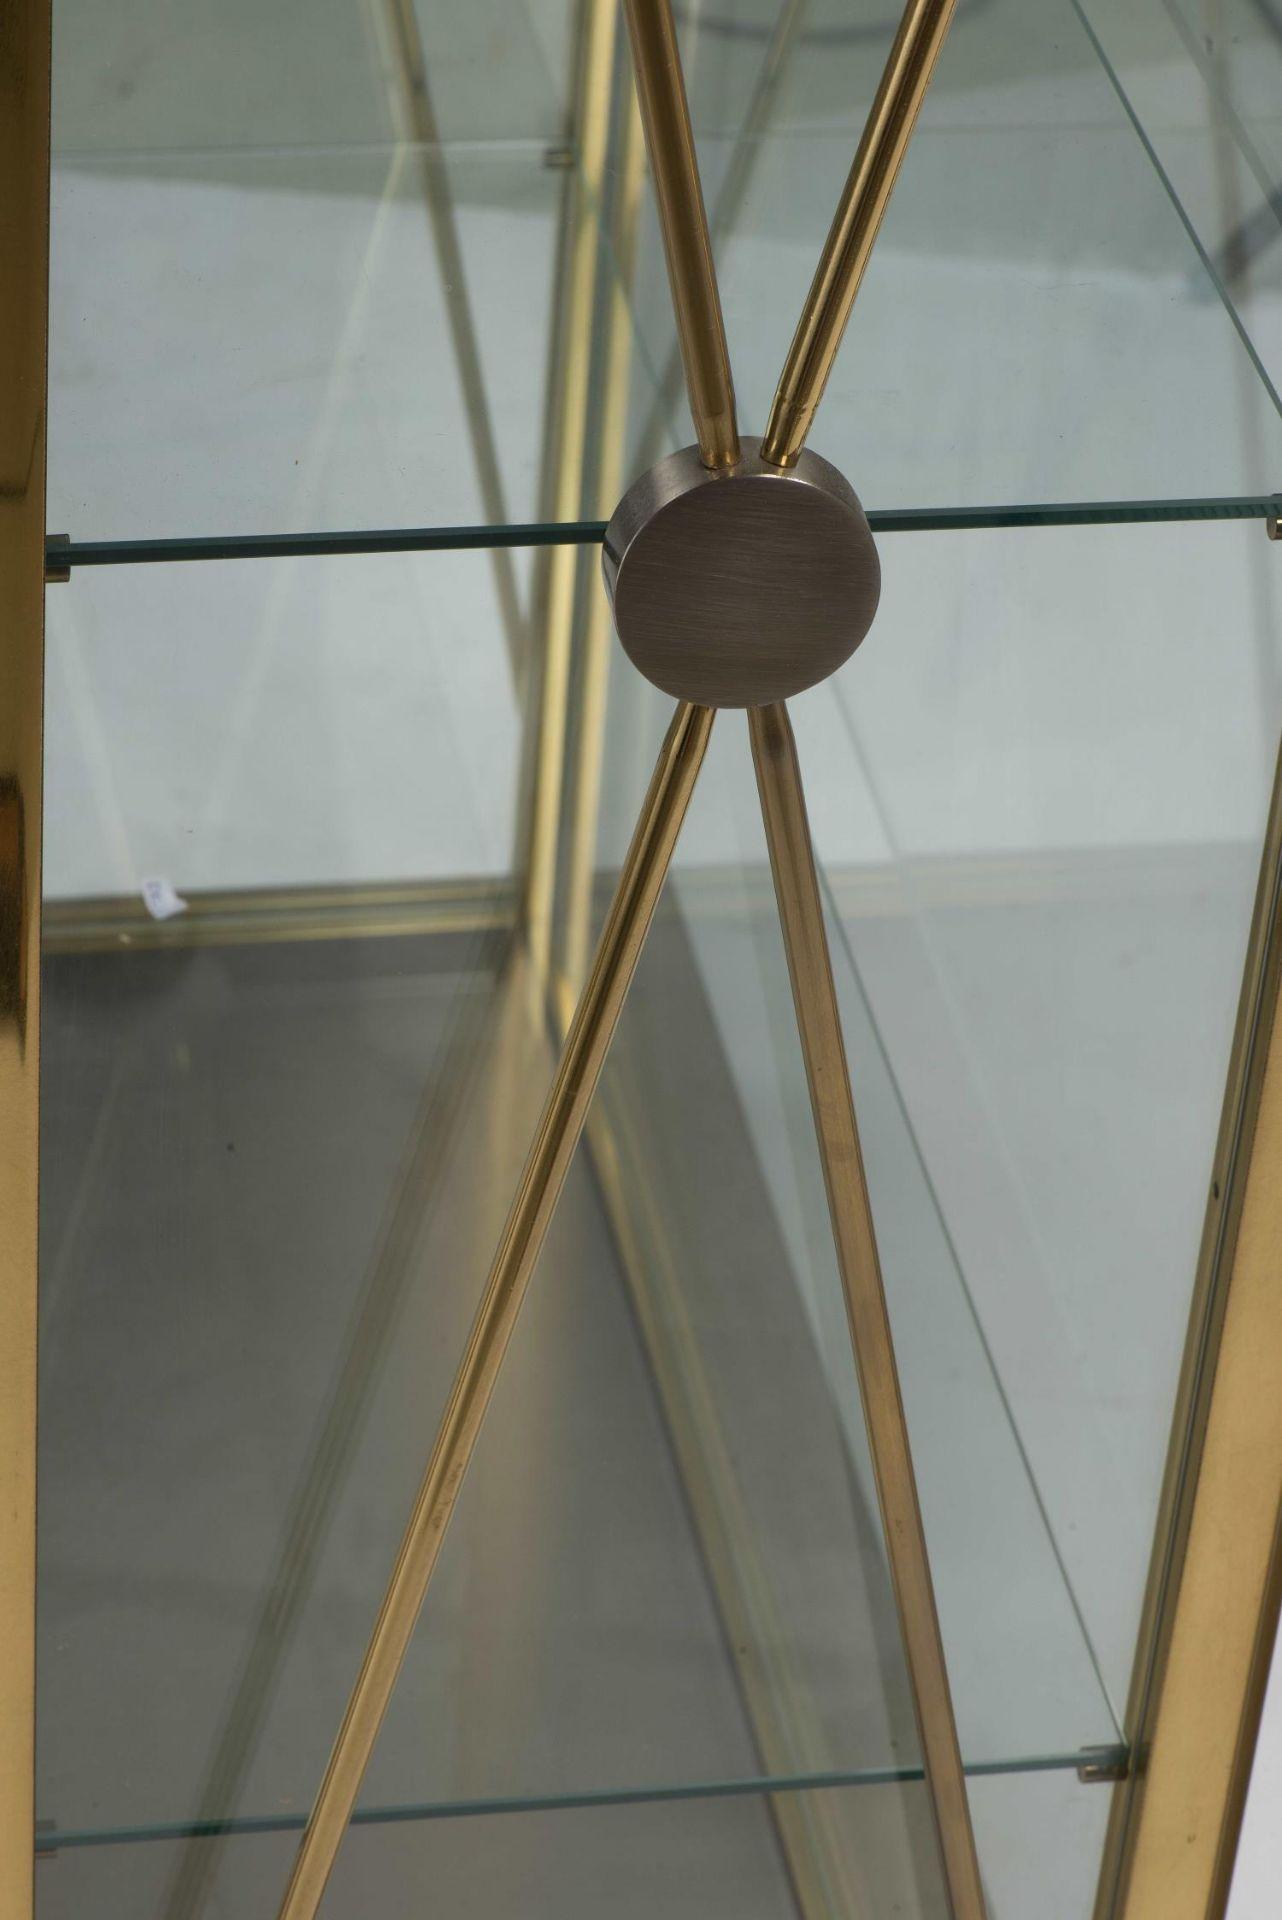 Vitrine en verre laiton et inox dans le goût de Pierre Vandel - Bild 5 aus 7